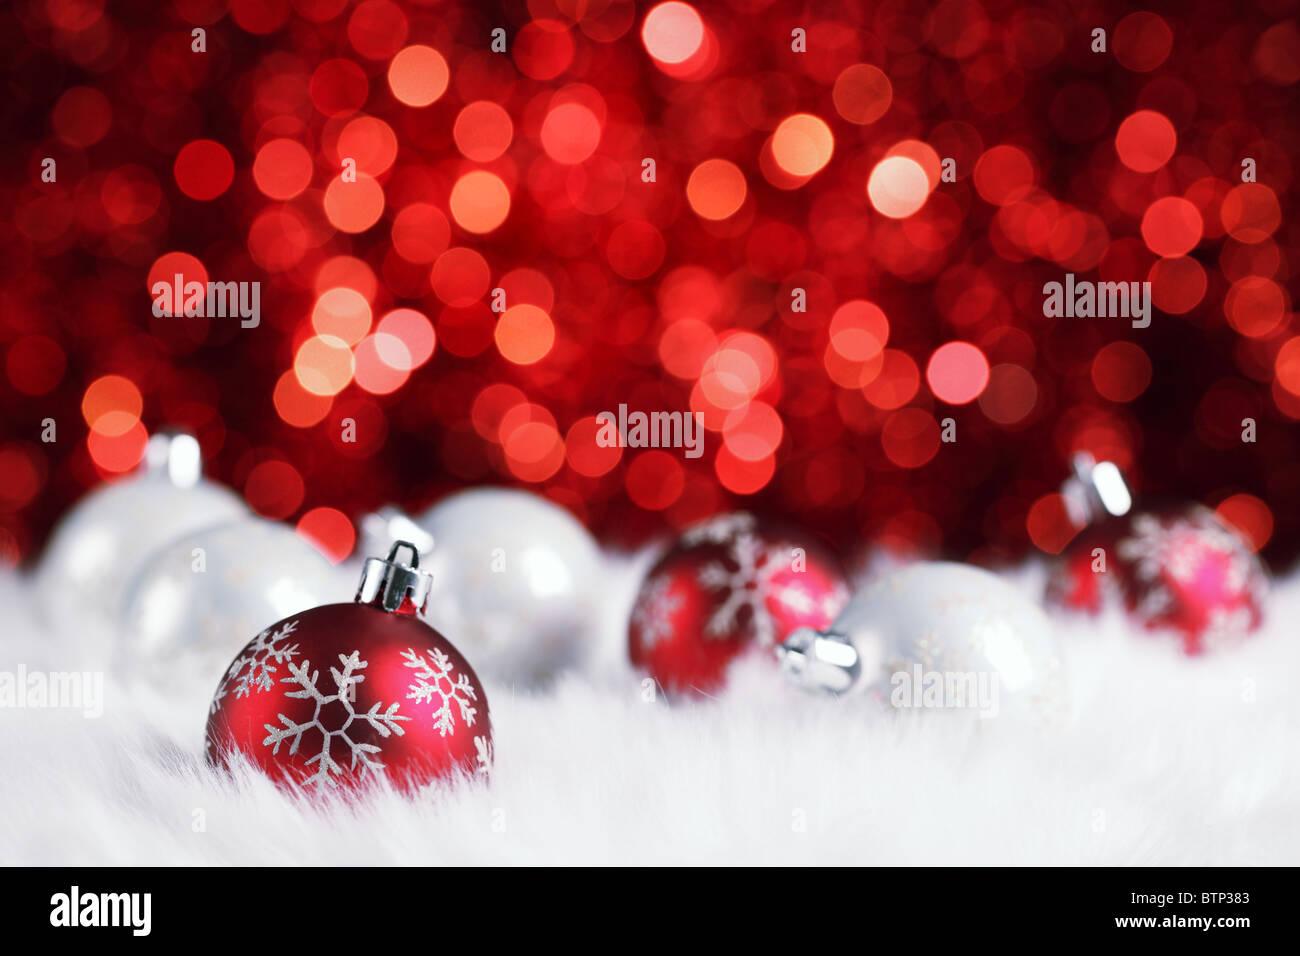 christmas ball on abstract light background,Shallow Dof. - Stock Image